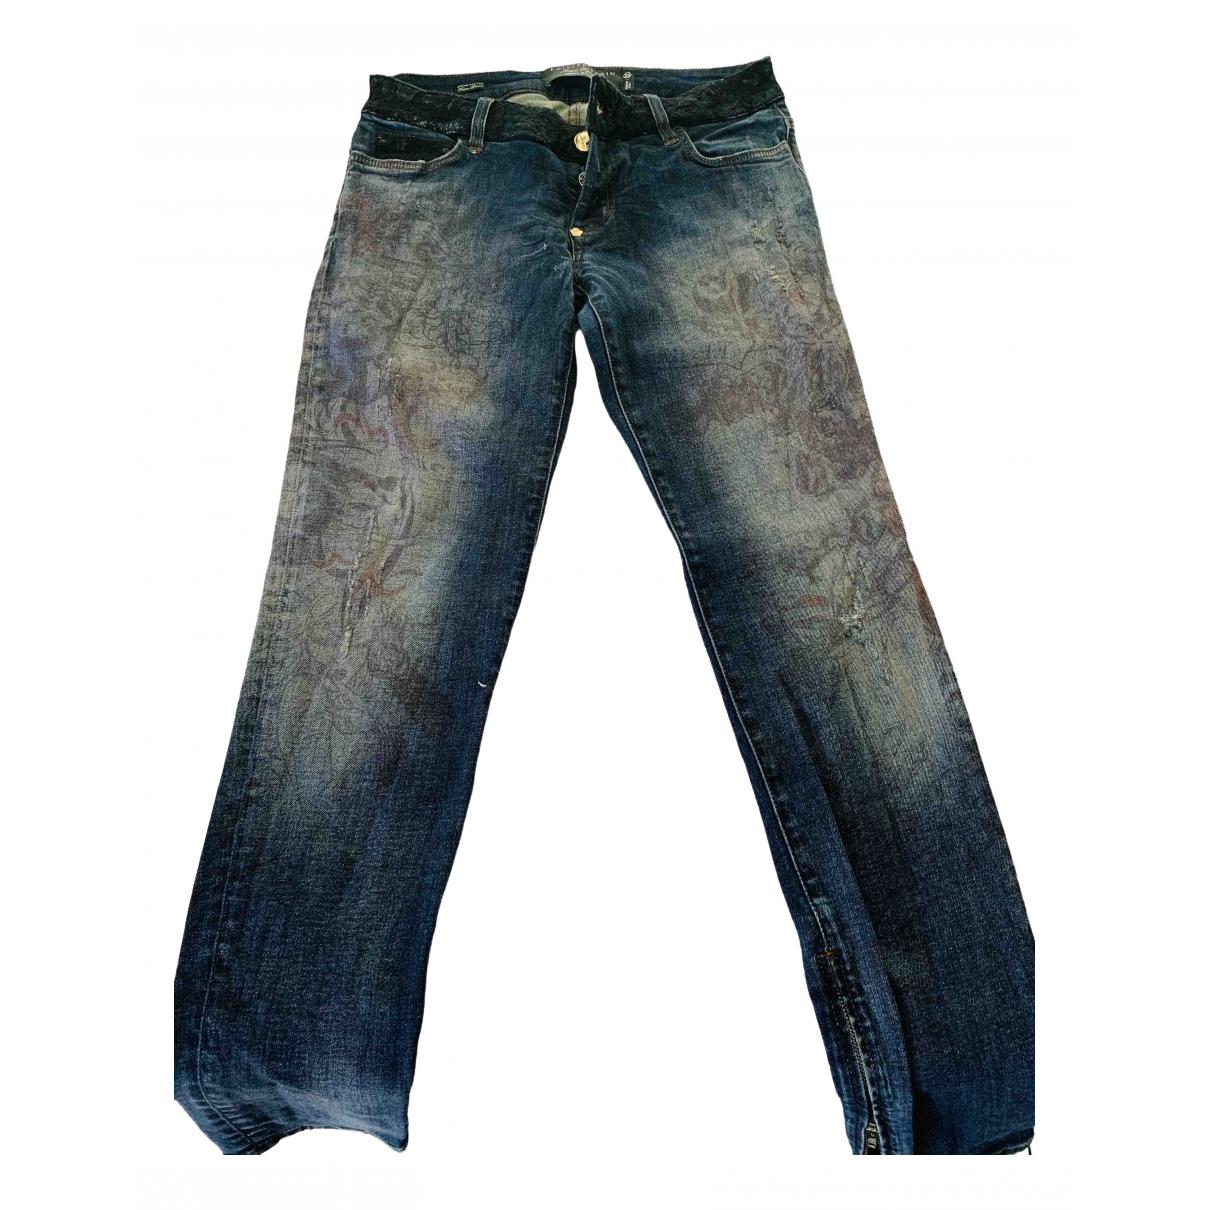 Philipp Plein \N Jeans in  Blau Denim - Jeans